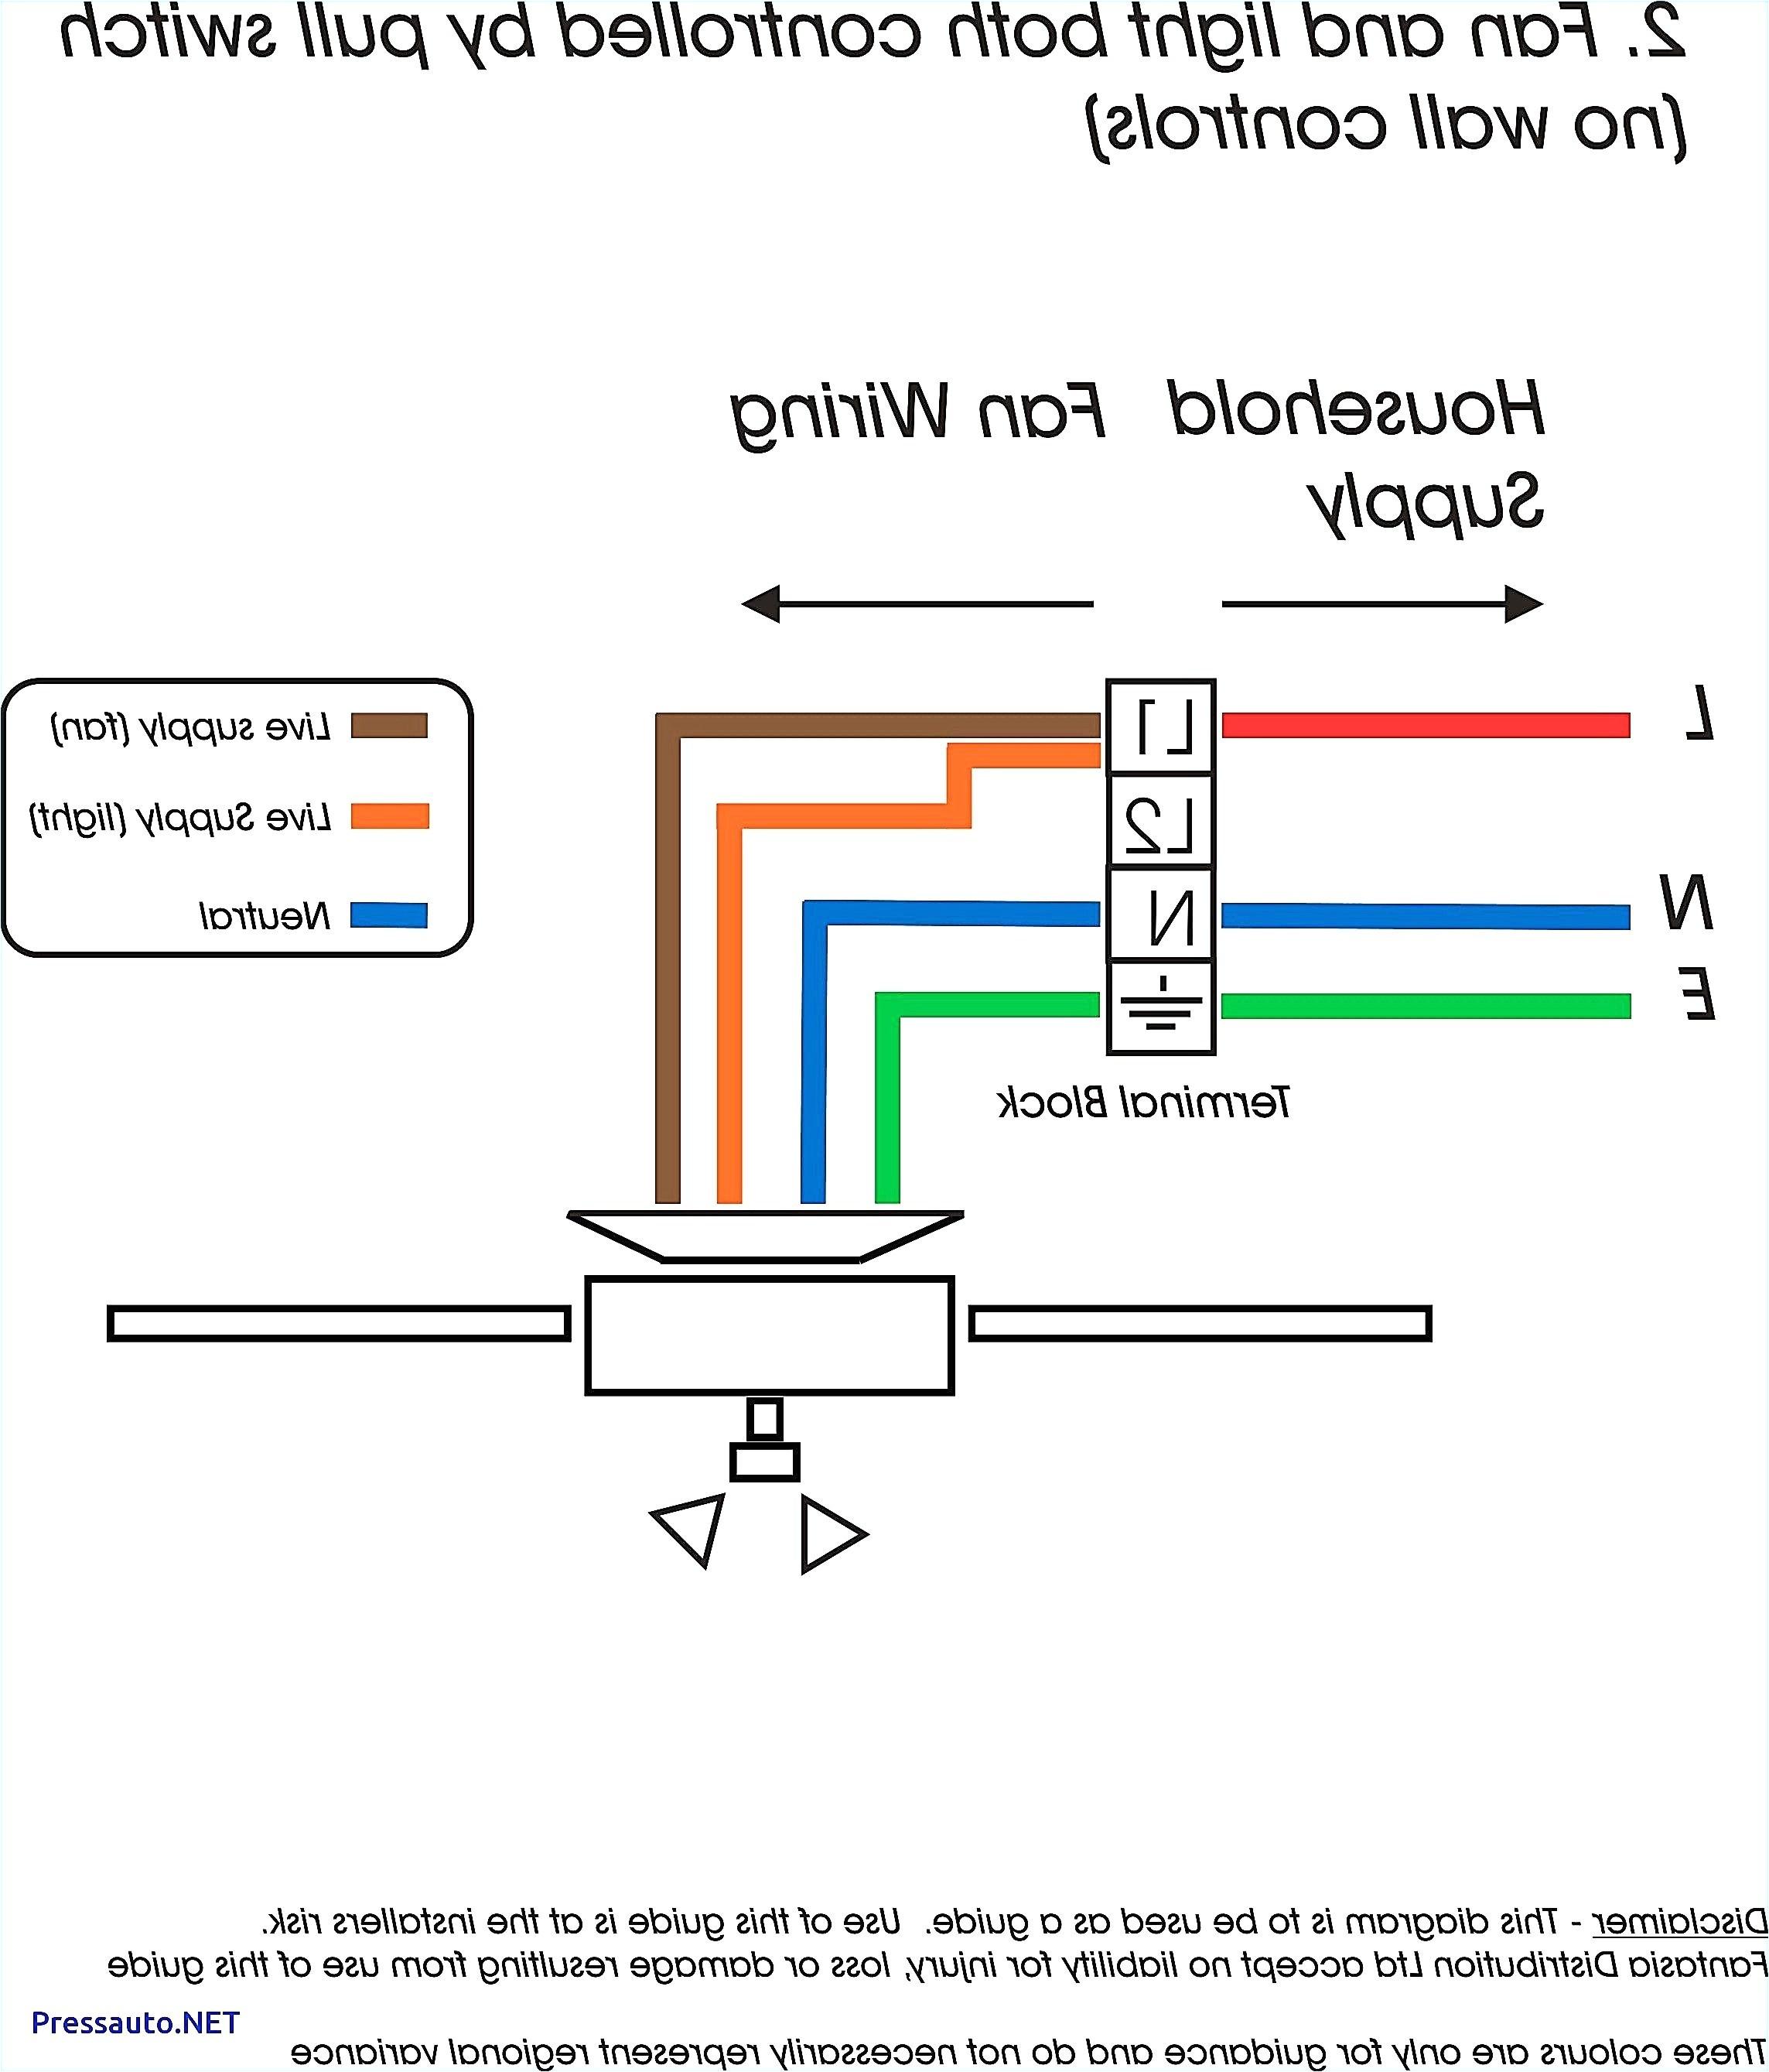 newest h u0026h trailer wiring diagram trailer wiring diagram trailers incom clean car trailer wiring diagram uk 7 way universal bypass relay wiring